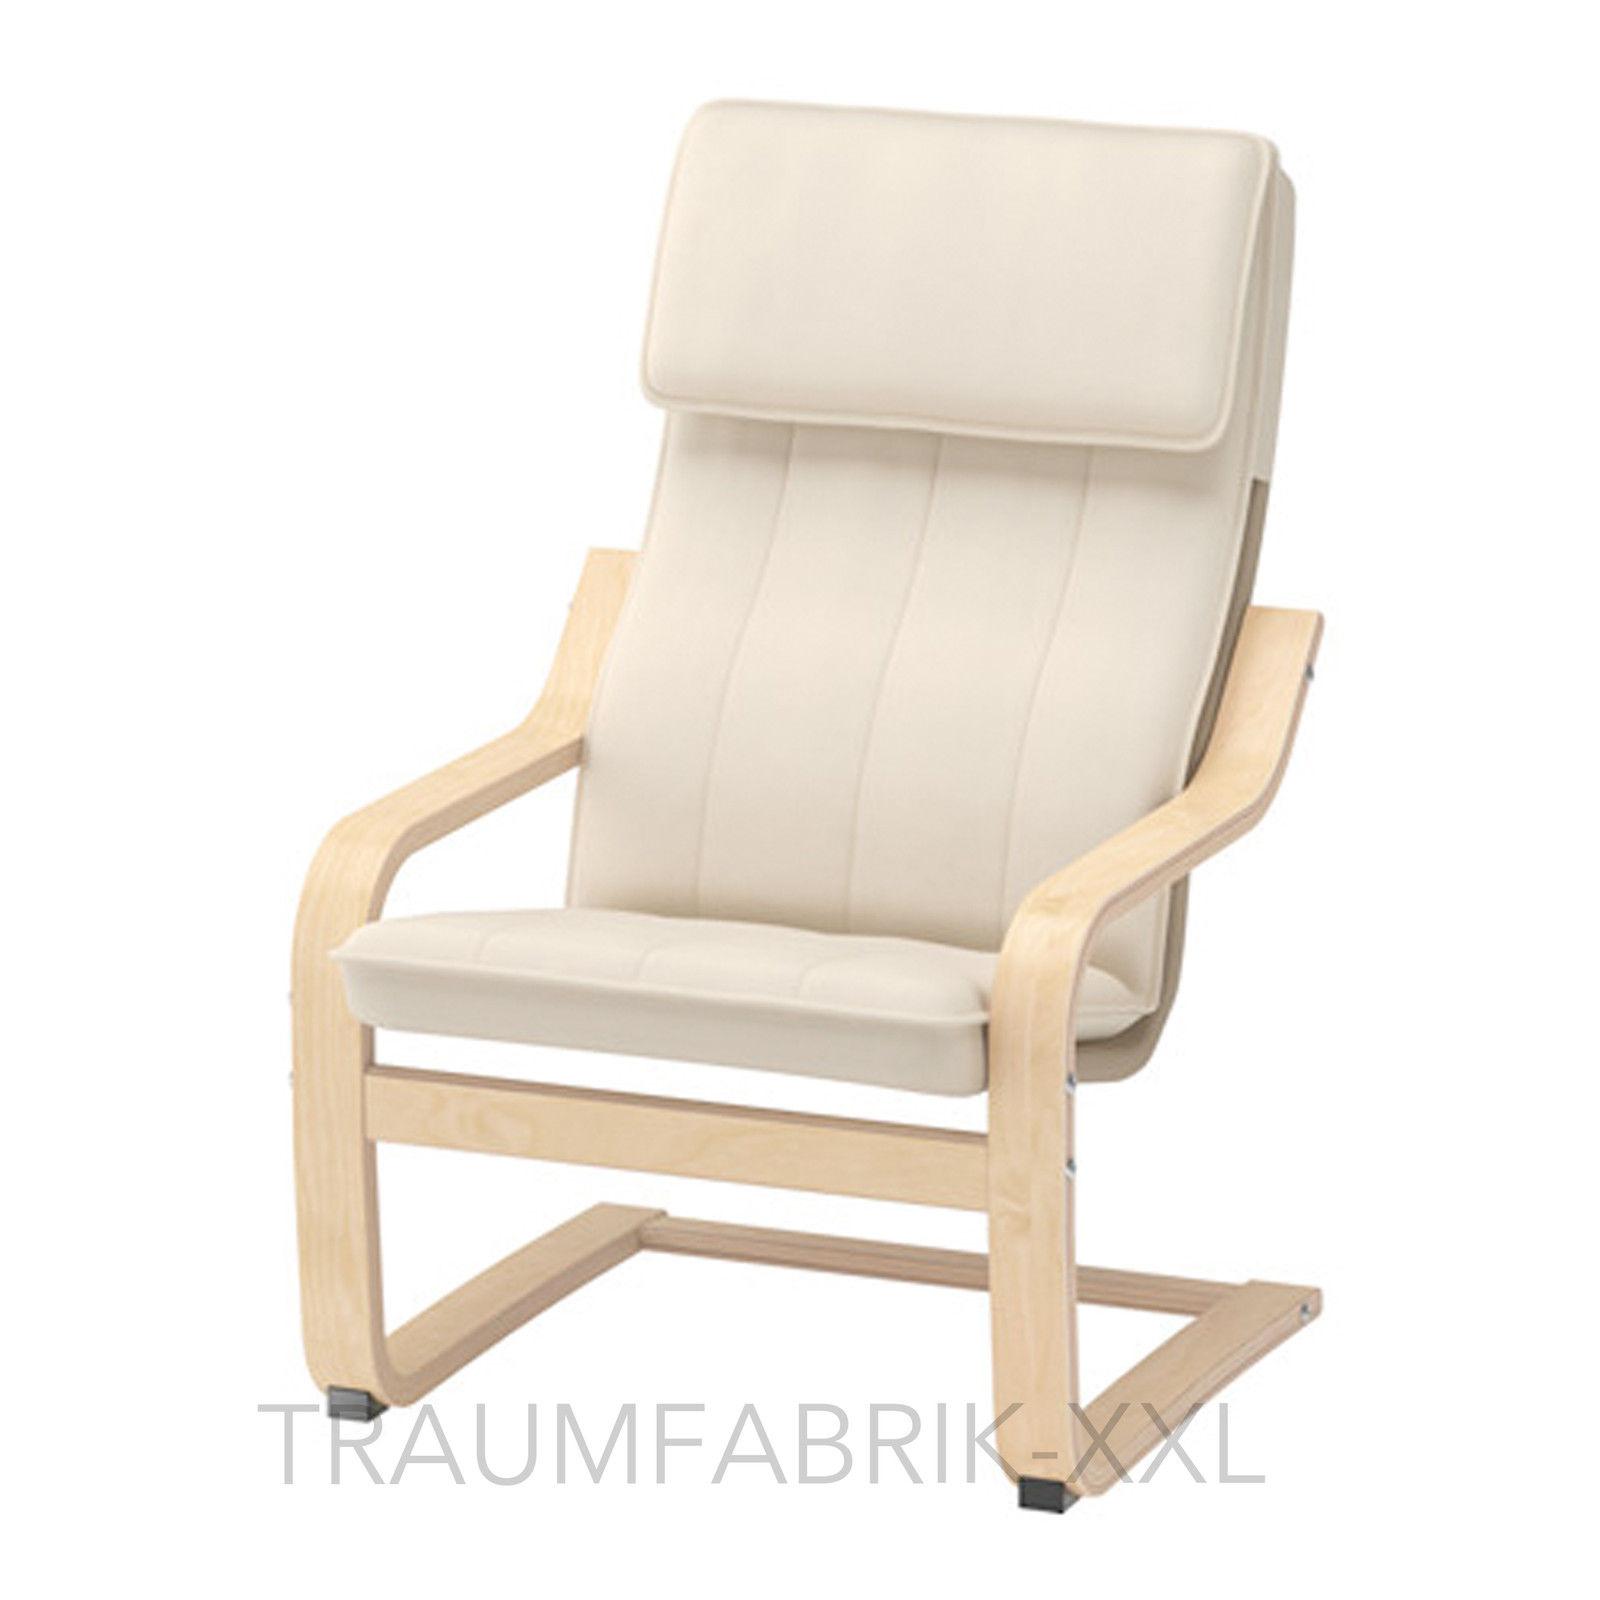 Schreibtischstuhl ikea  IKEA POÄNG Kindersessel Birkenfurnier Kinder Sessel Stuhl ...